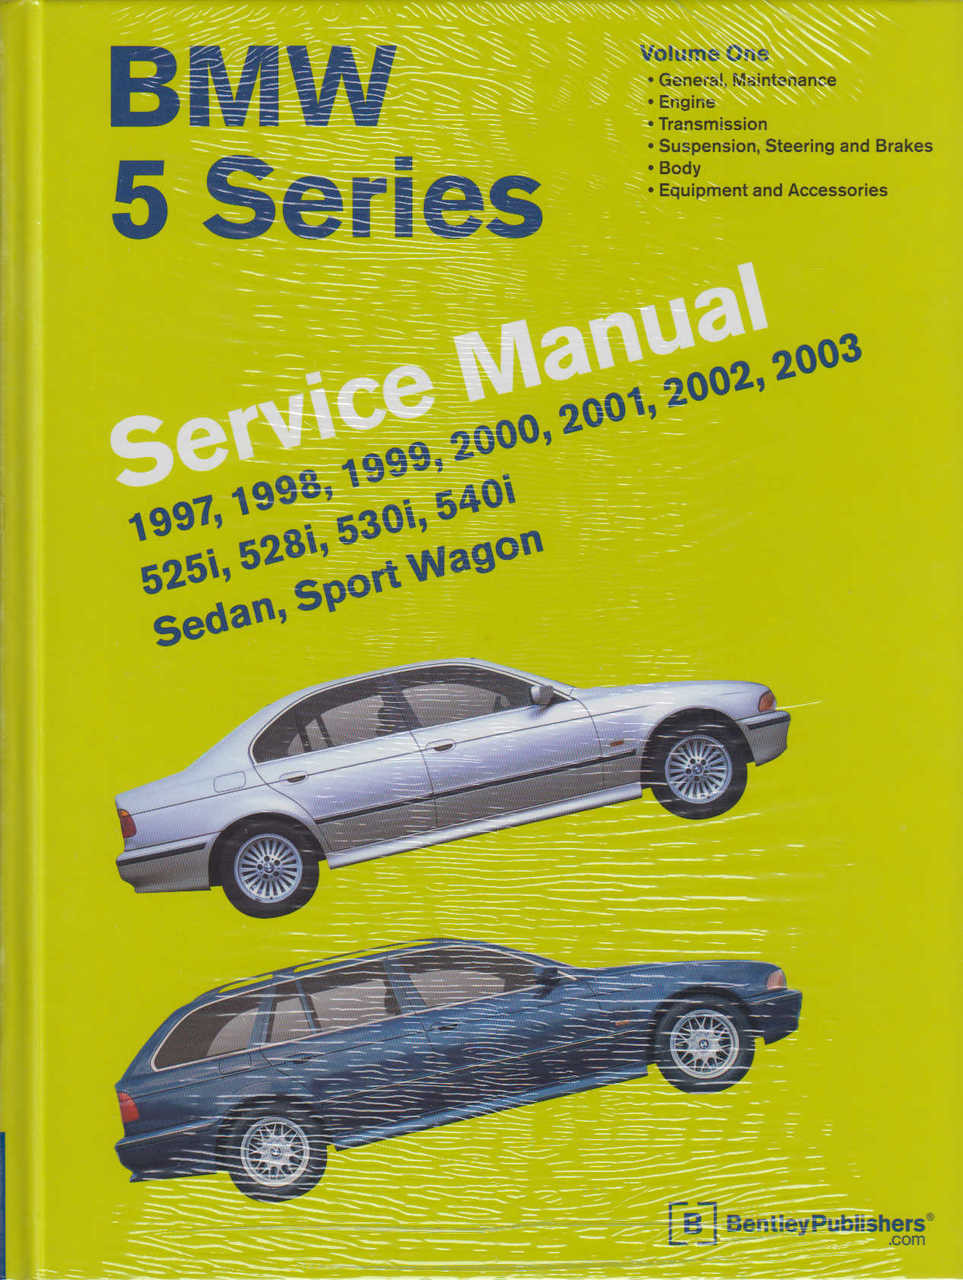 bmw 5 series e39 1997 2003 workshop manual diagram of 1994 bmw 325i bmw 5 series e39 525i, 528i, 530i, 540i 1997 2003 workshop manual